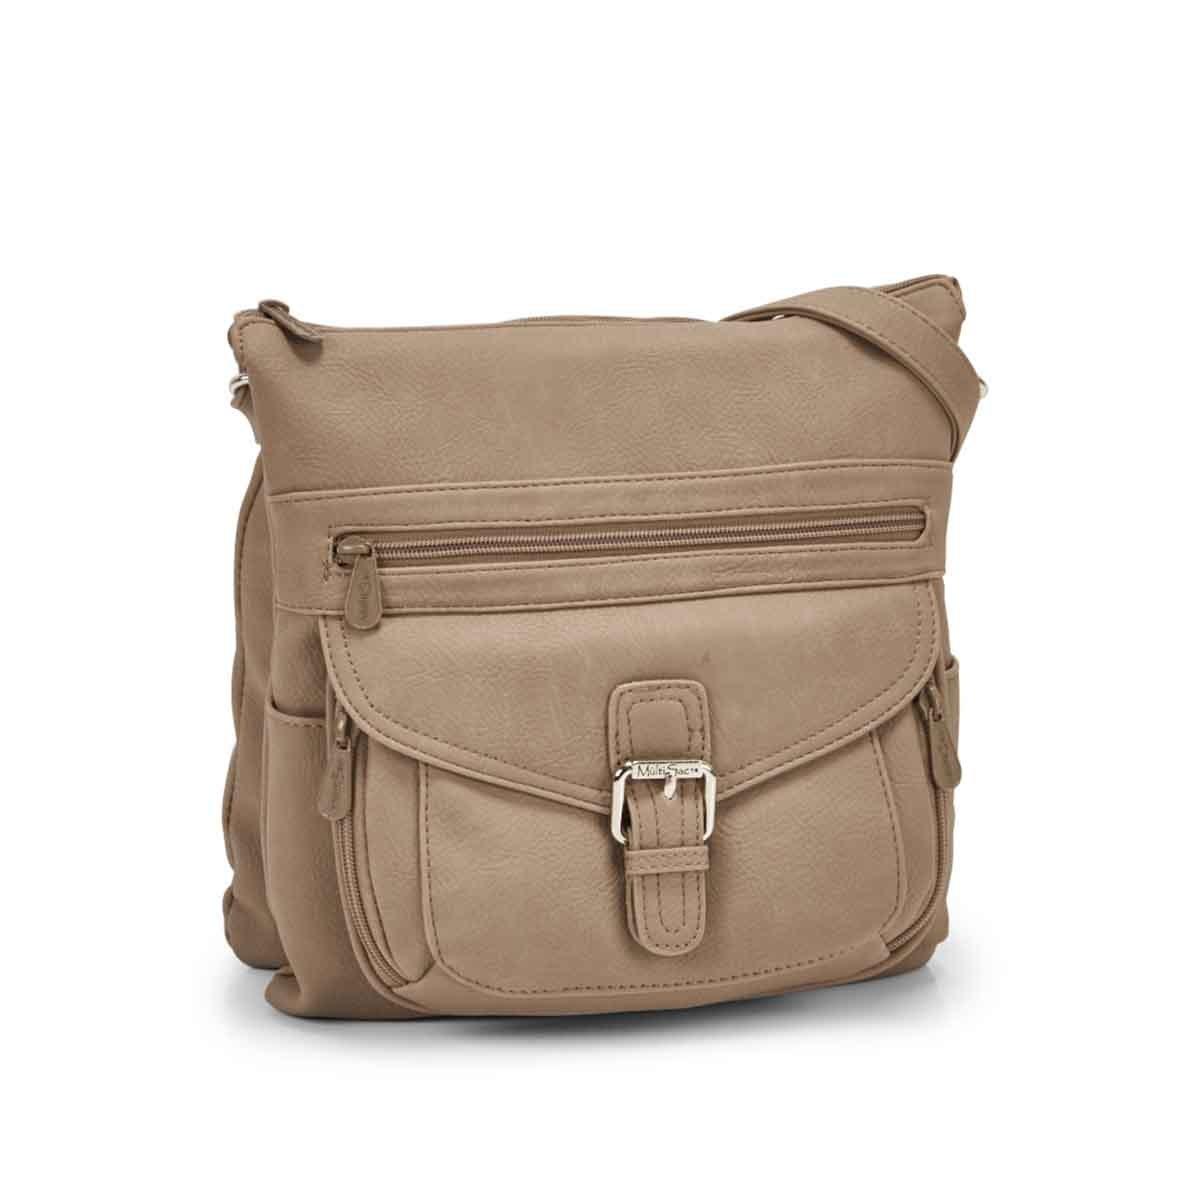 Women's CONTOUR taupe cross body bag